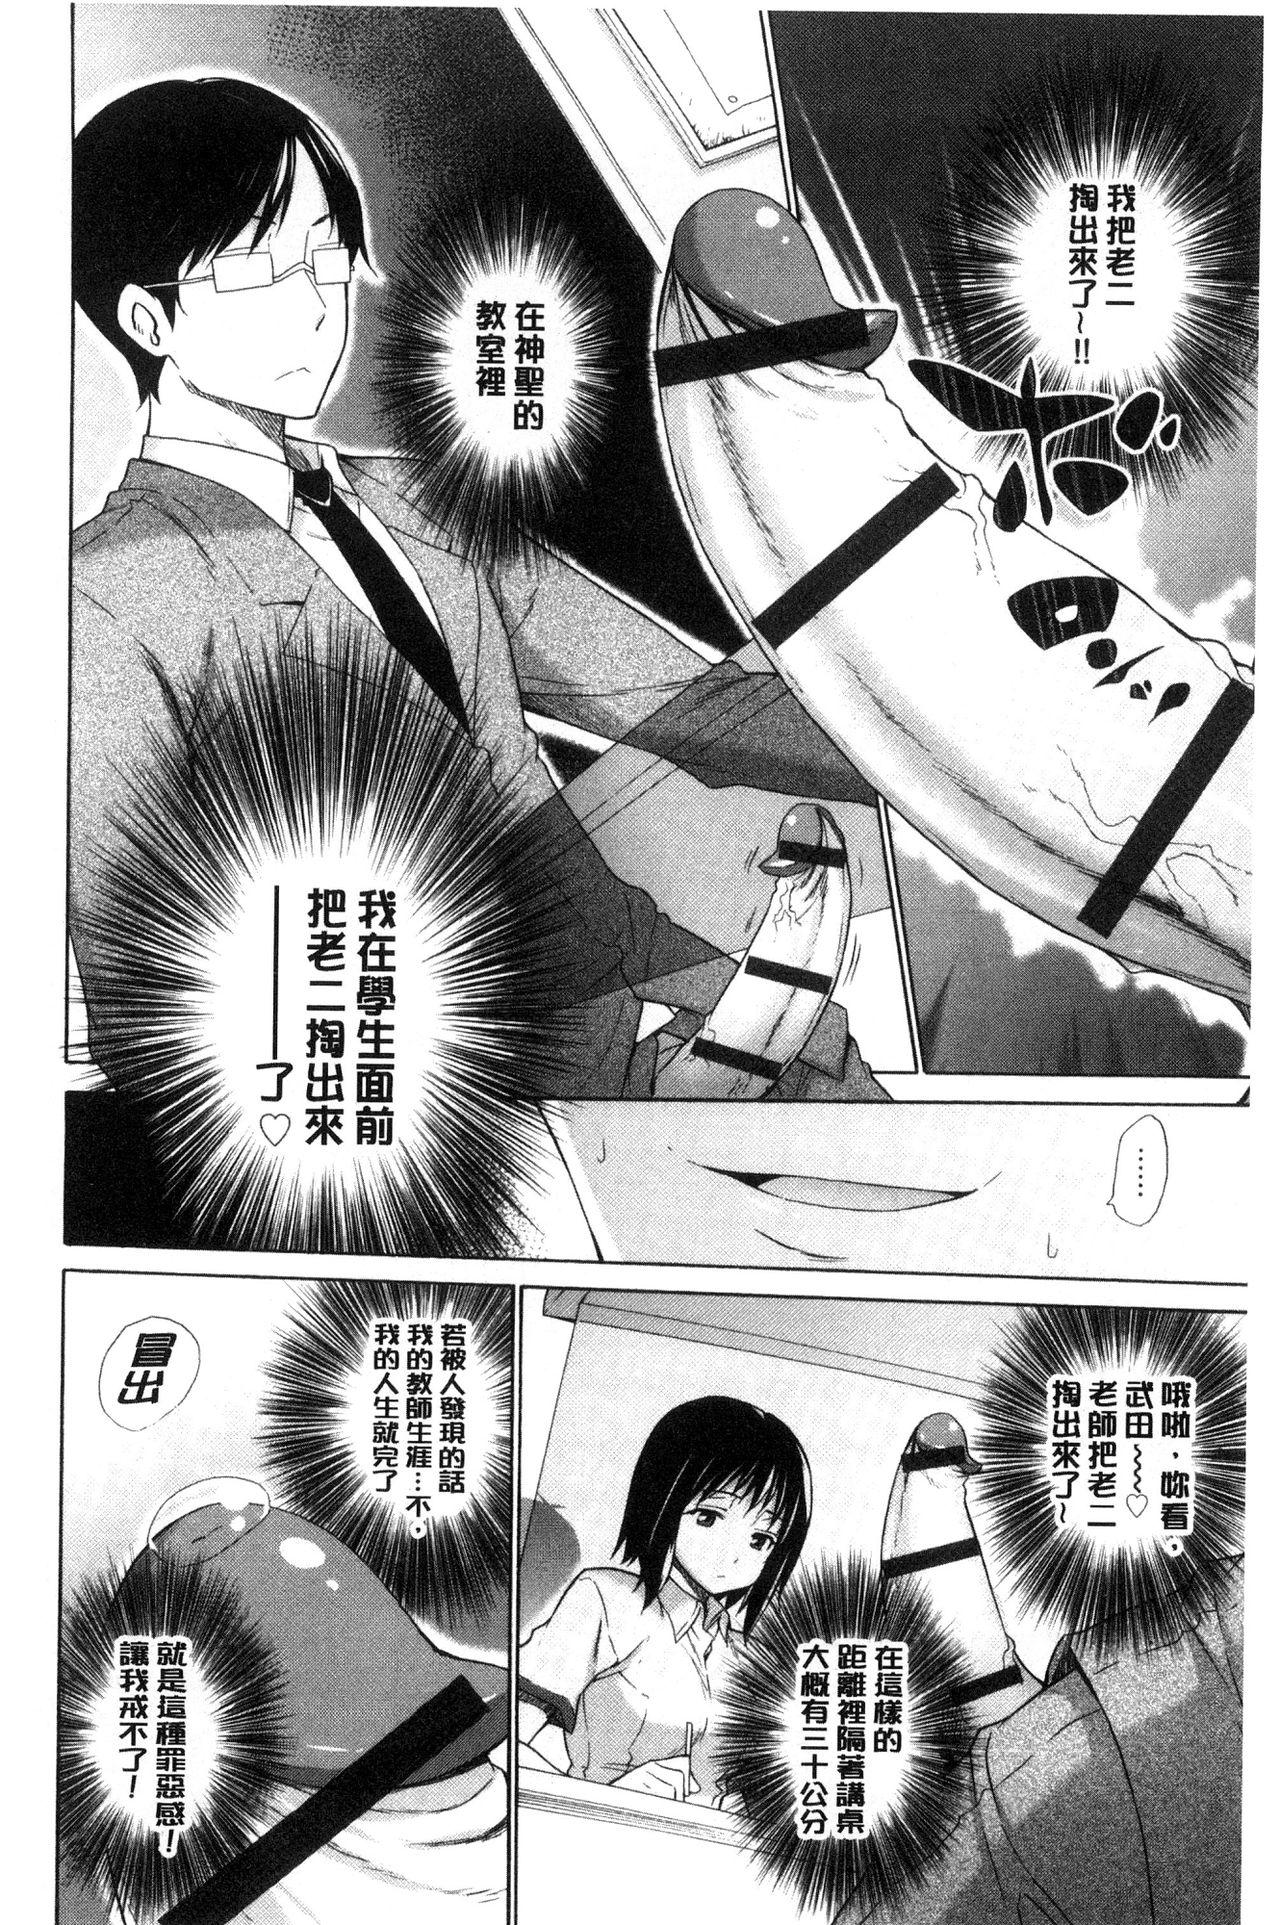 [Miyano Kintarou] Hishoujo List - The Non-Virgin List  | 非處女的名單 [Chinese] 111